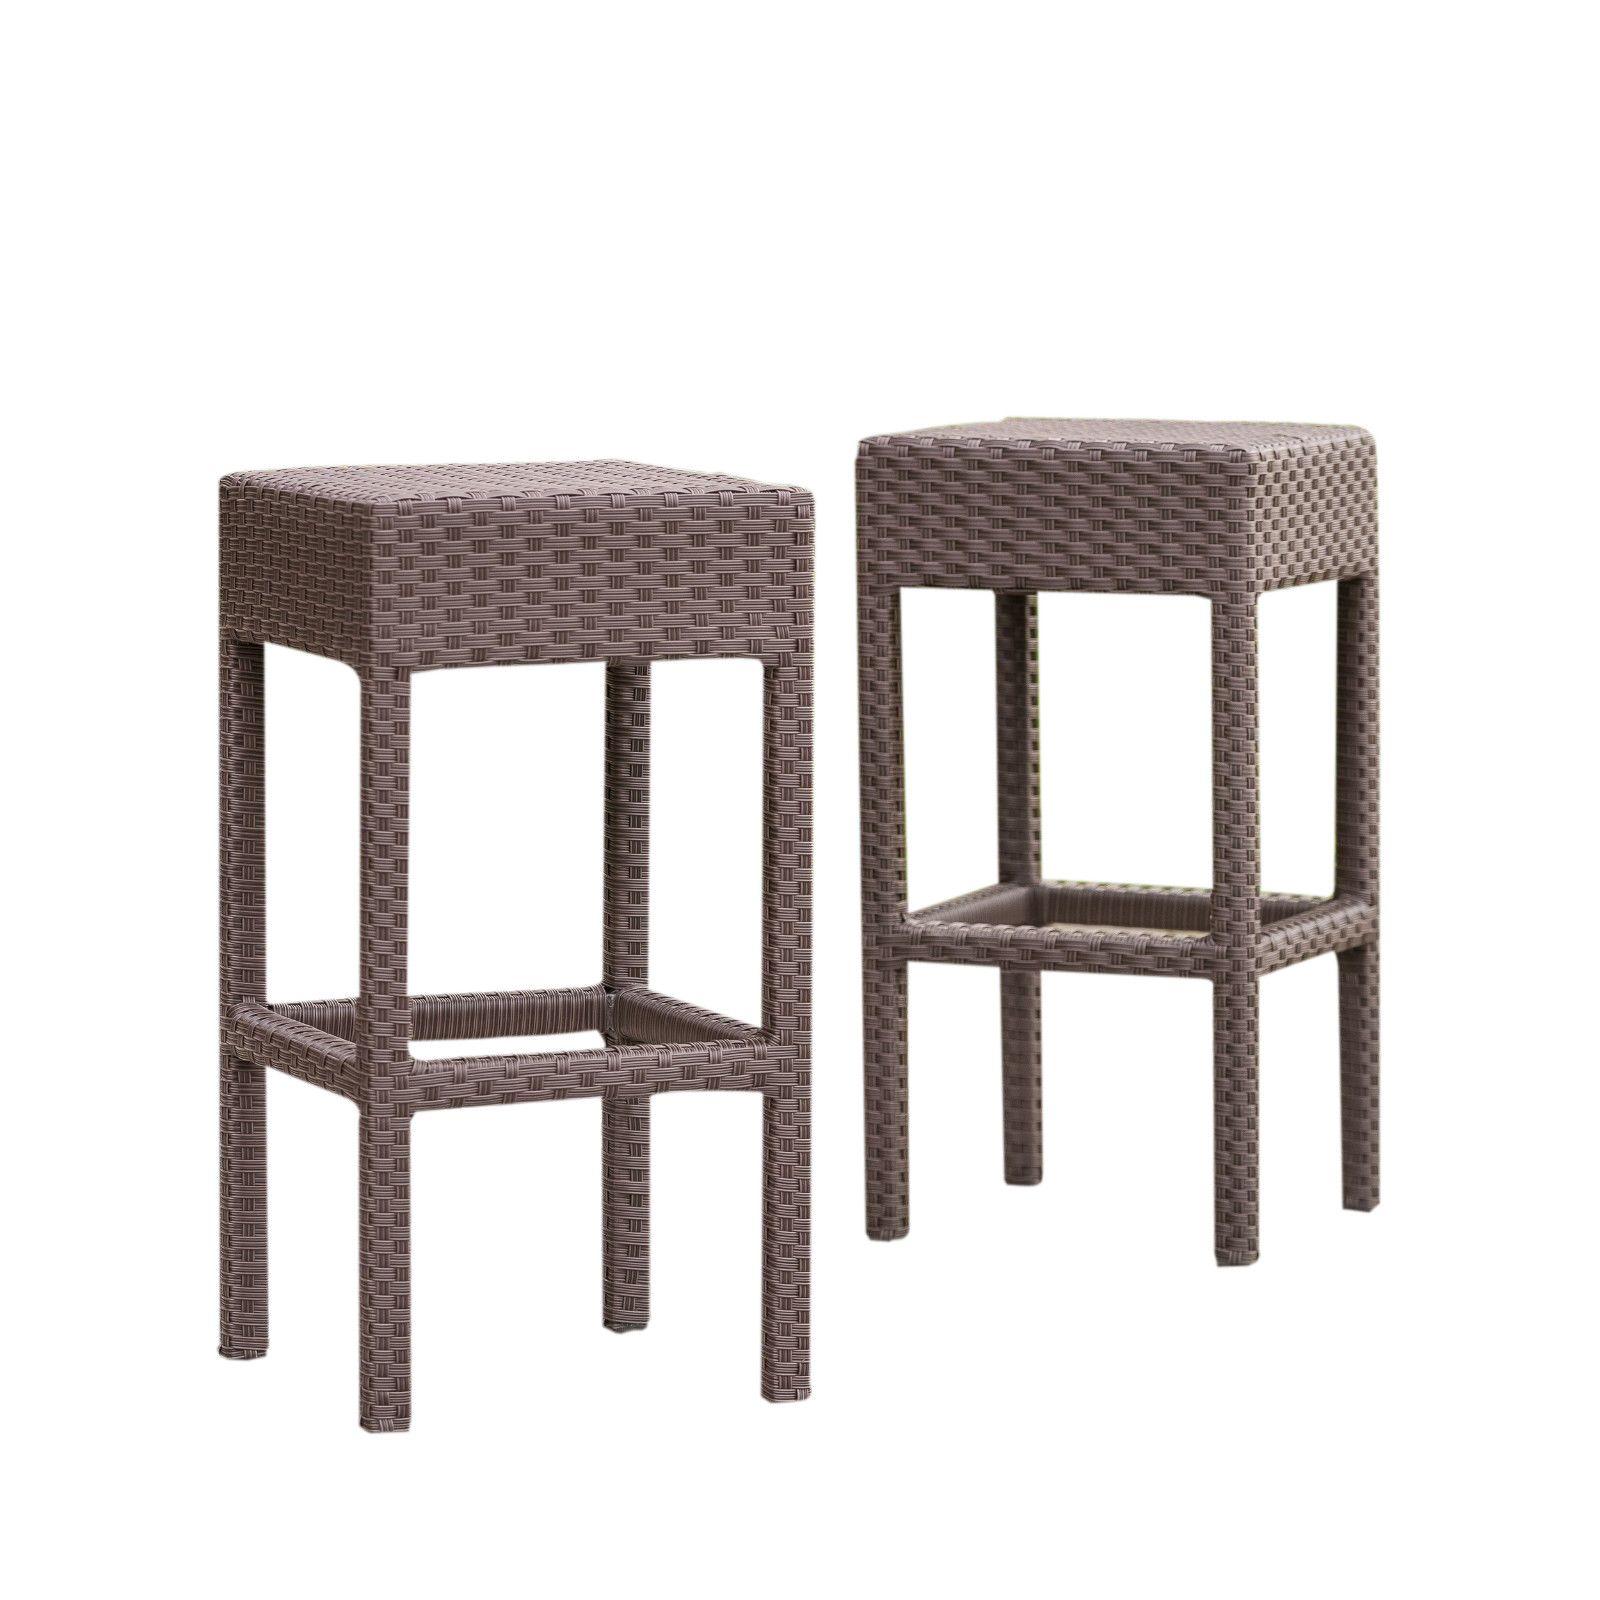 2 Piece Outdoor Patio Wicker Backless Barstool